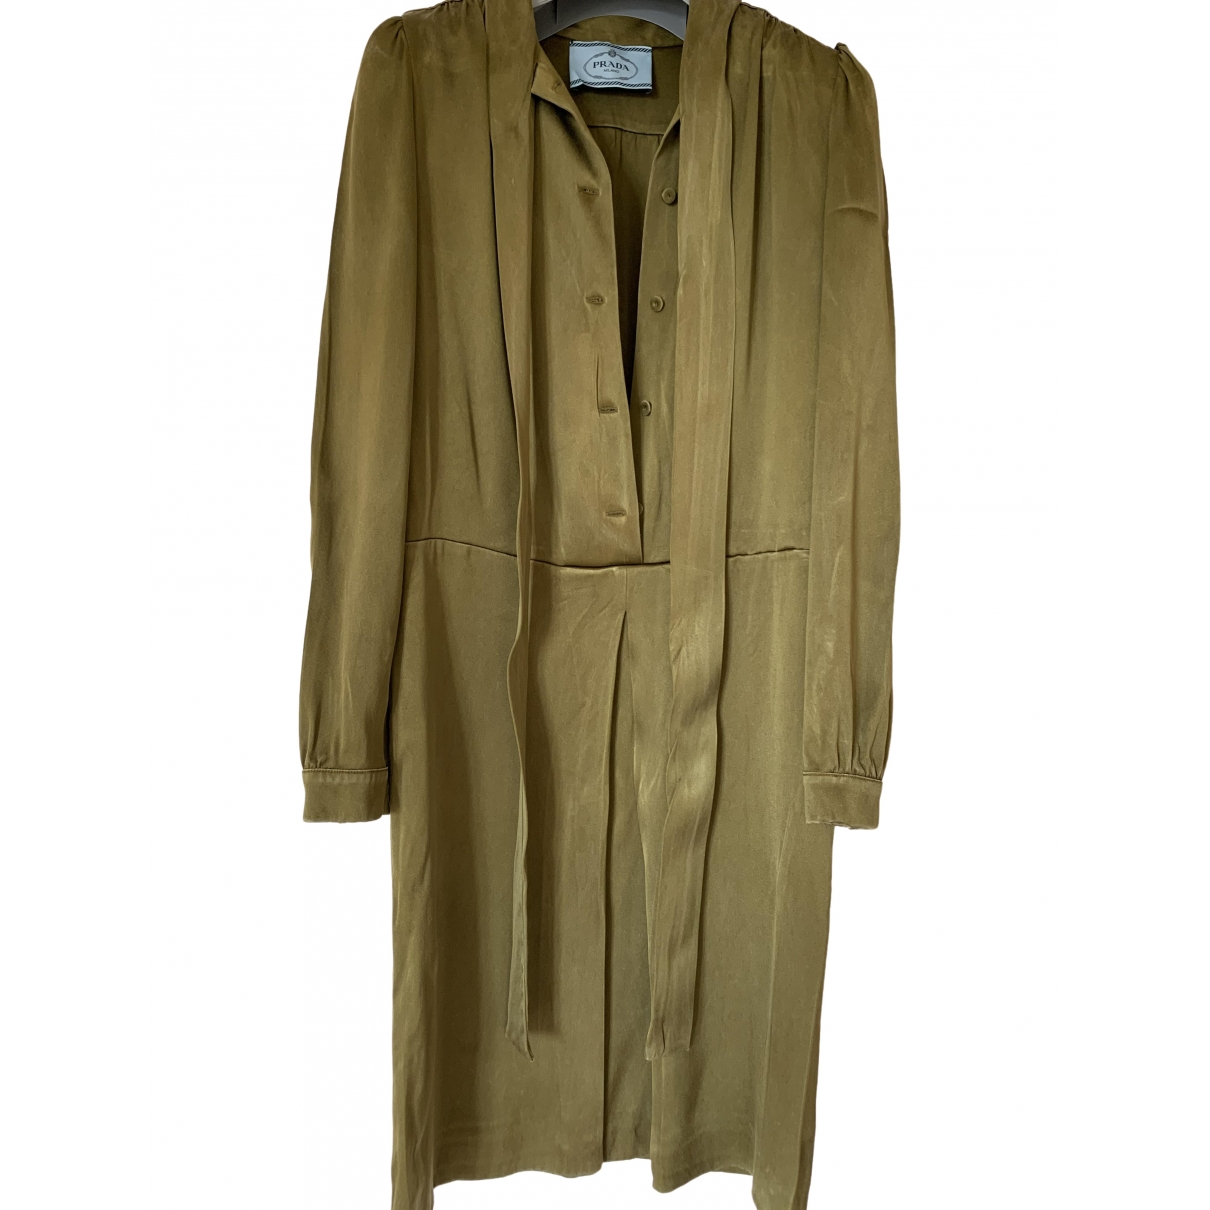 Prada \N Khaki dress for Women 38 FR